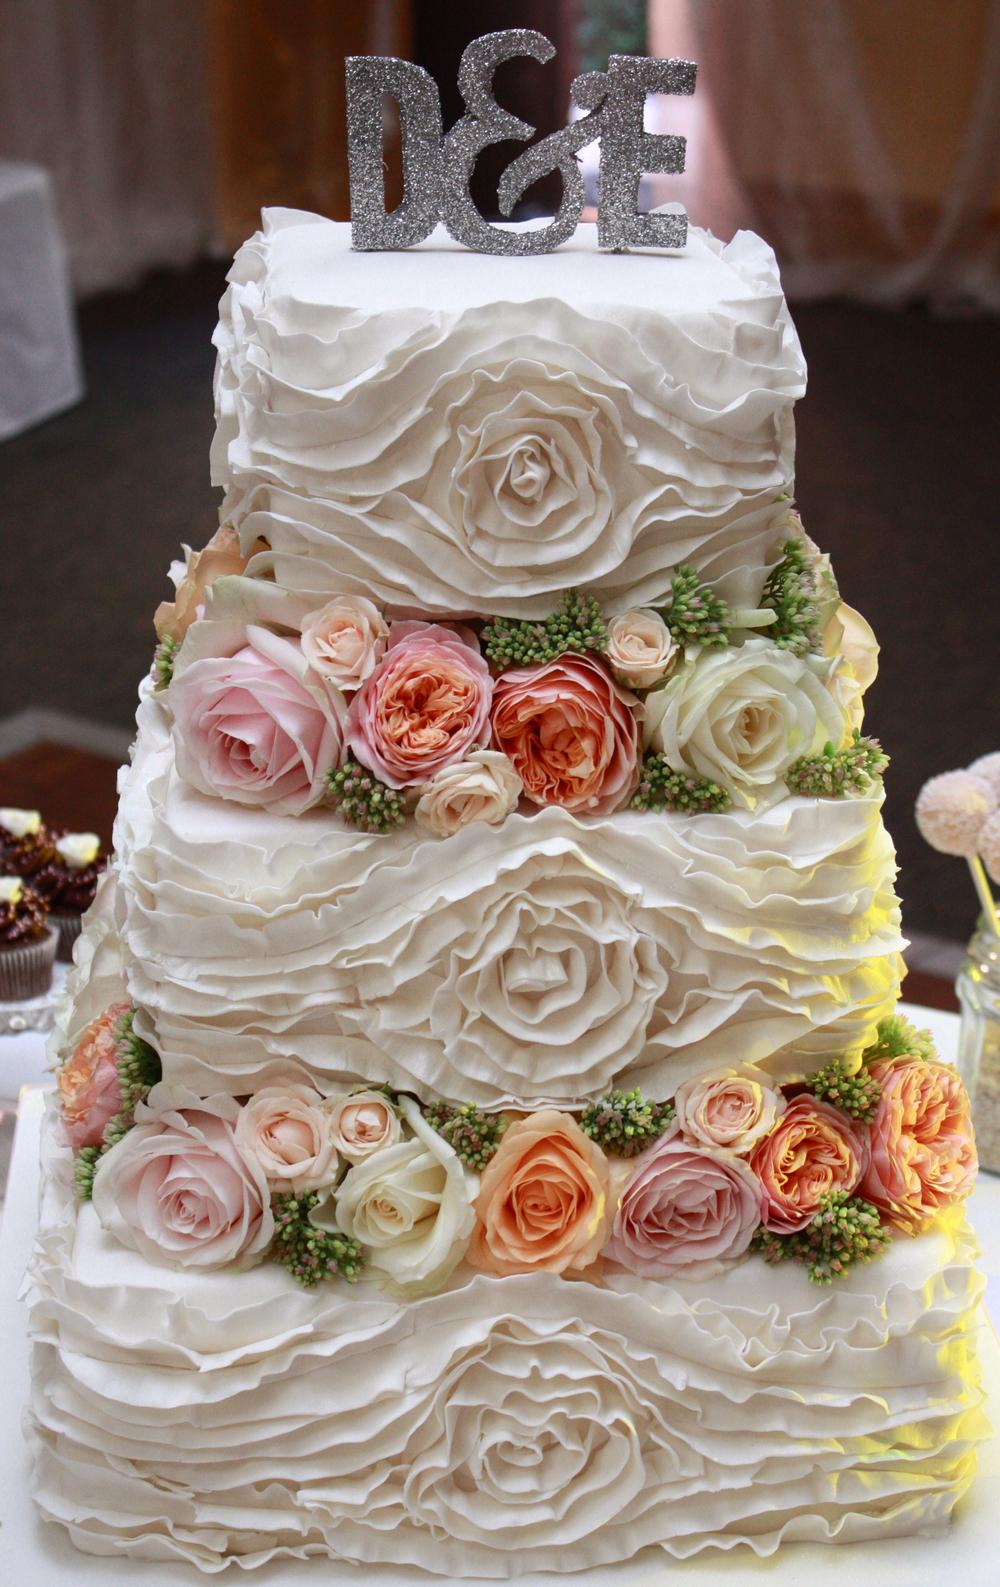 Iced ruffle rose cake